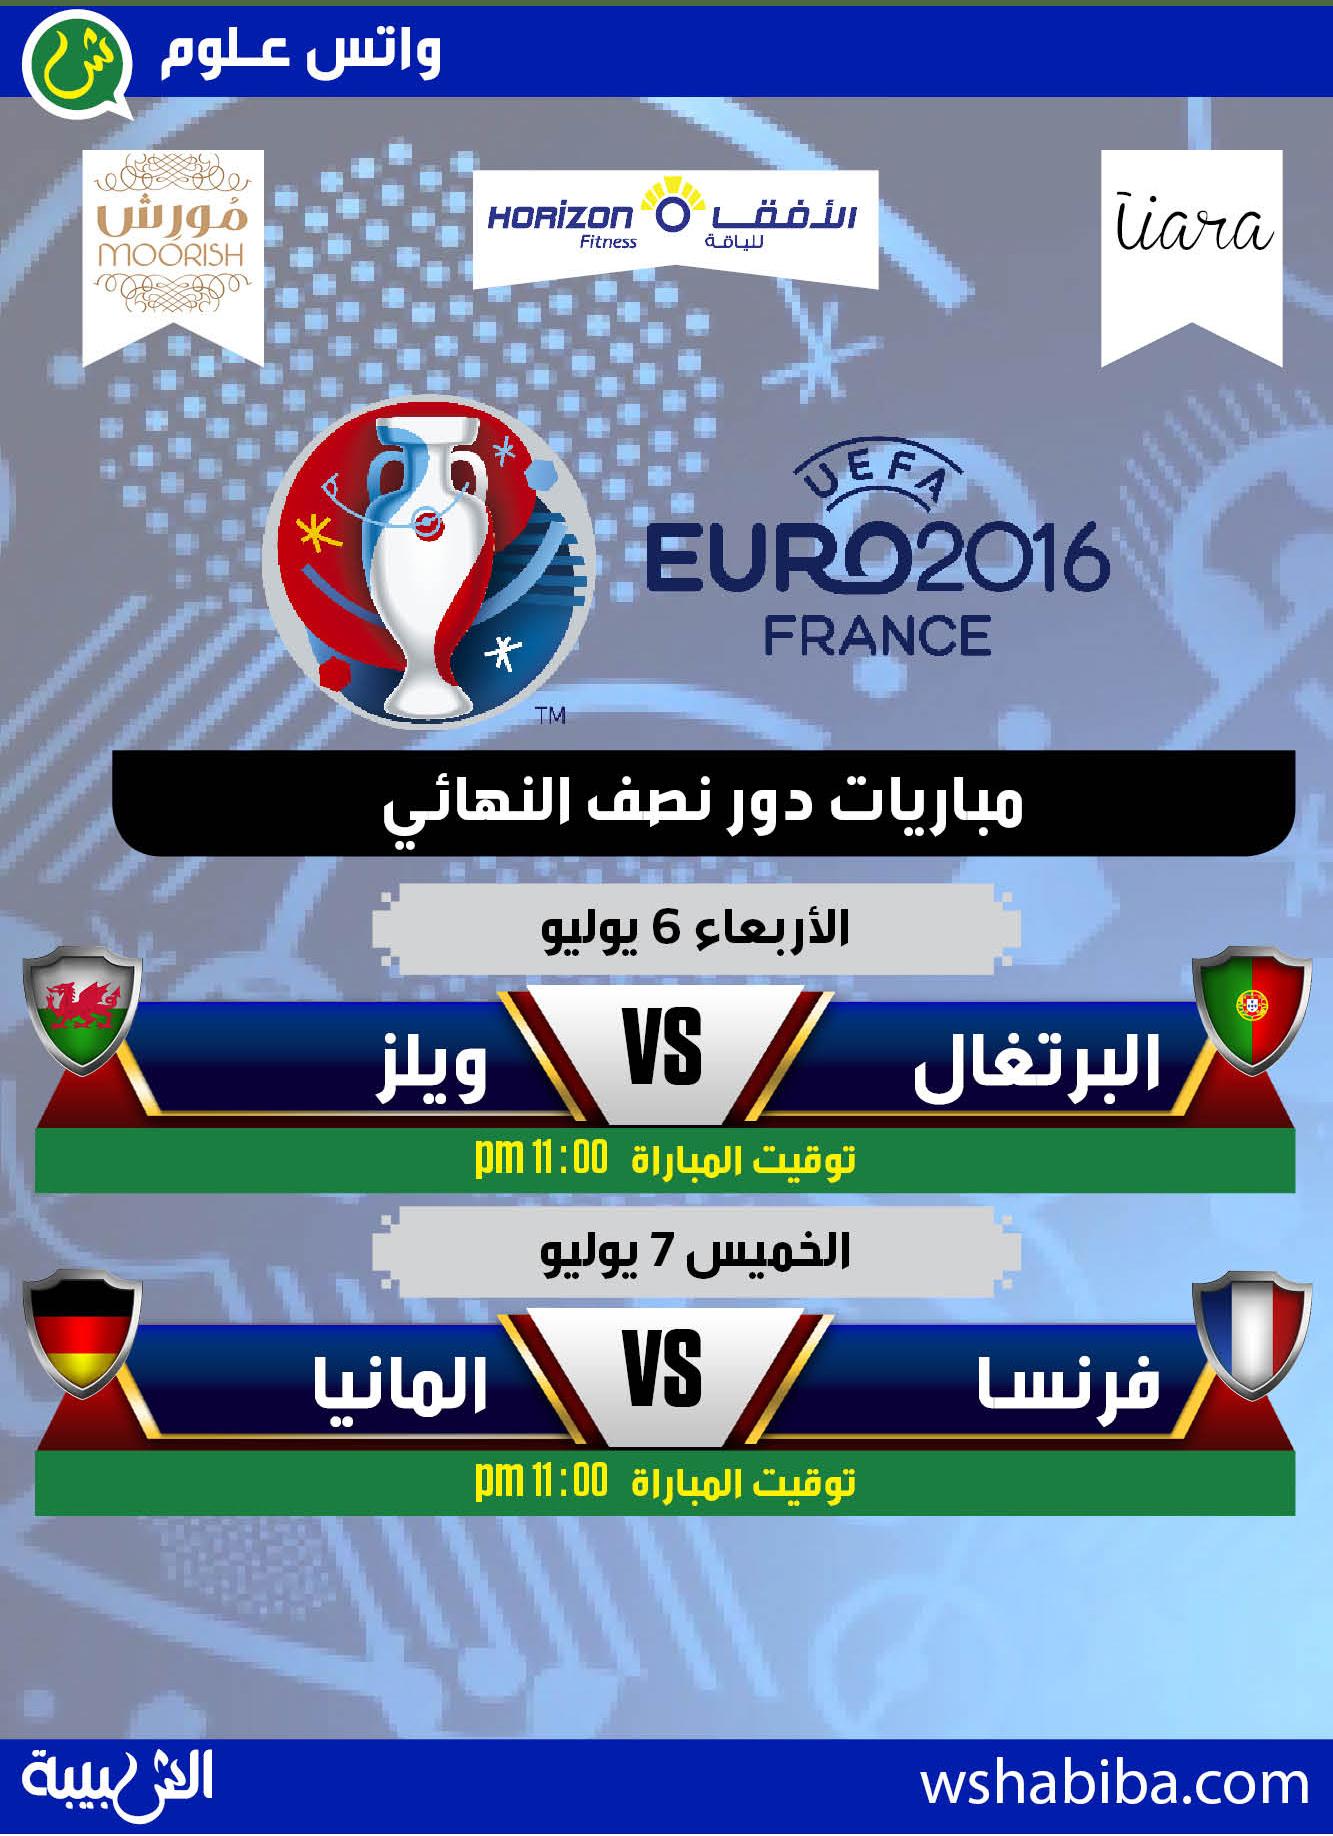 مواعيد مواجهات الدور نصف النهائي في يورو 2016